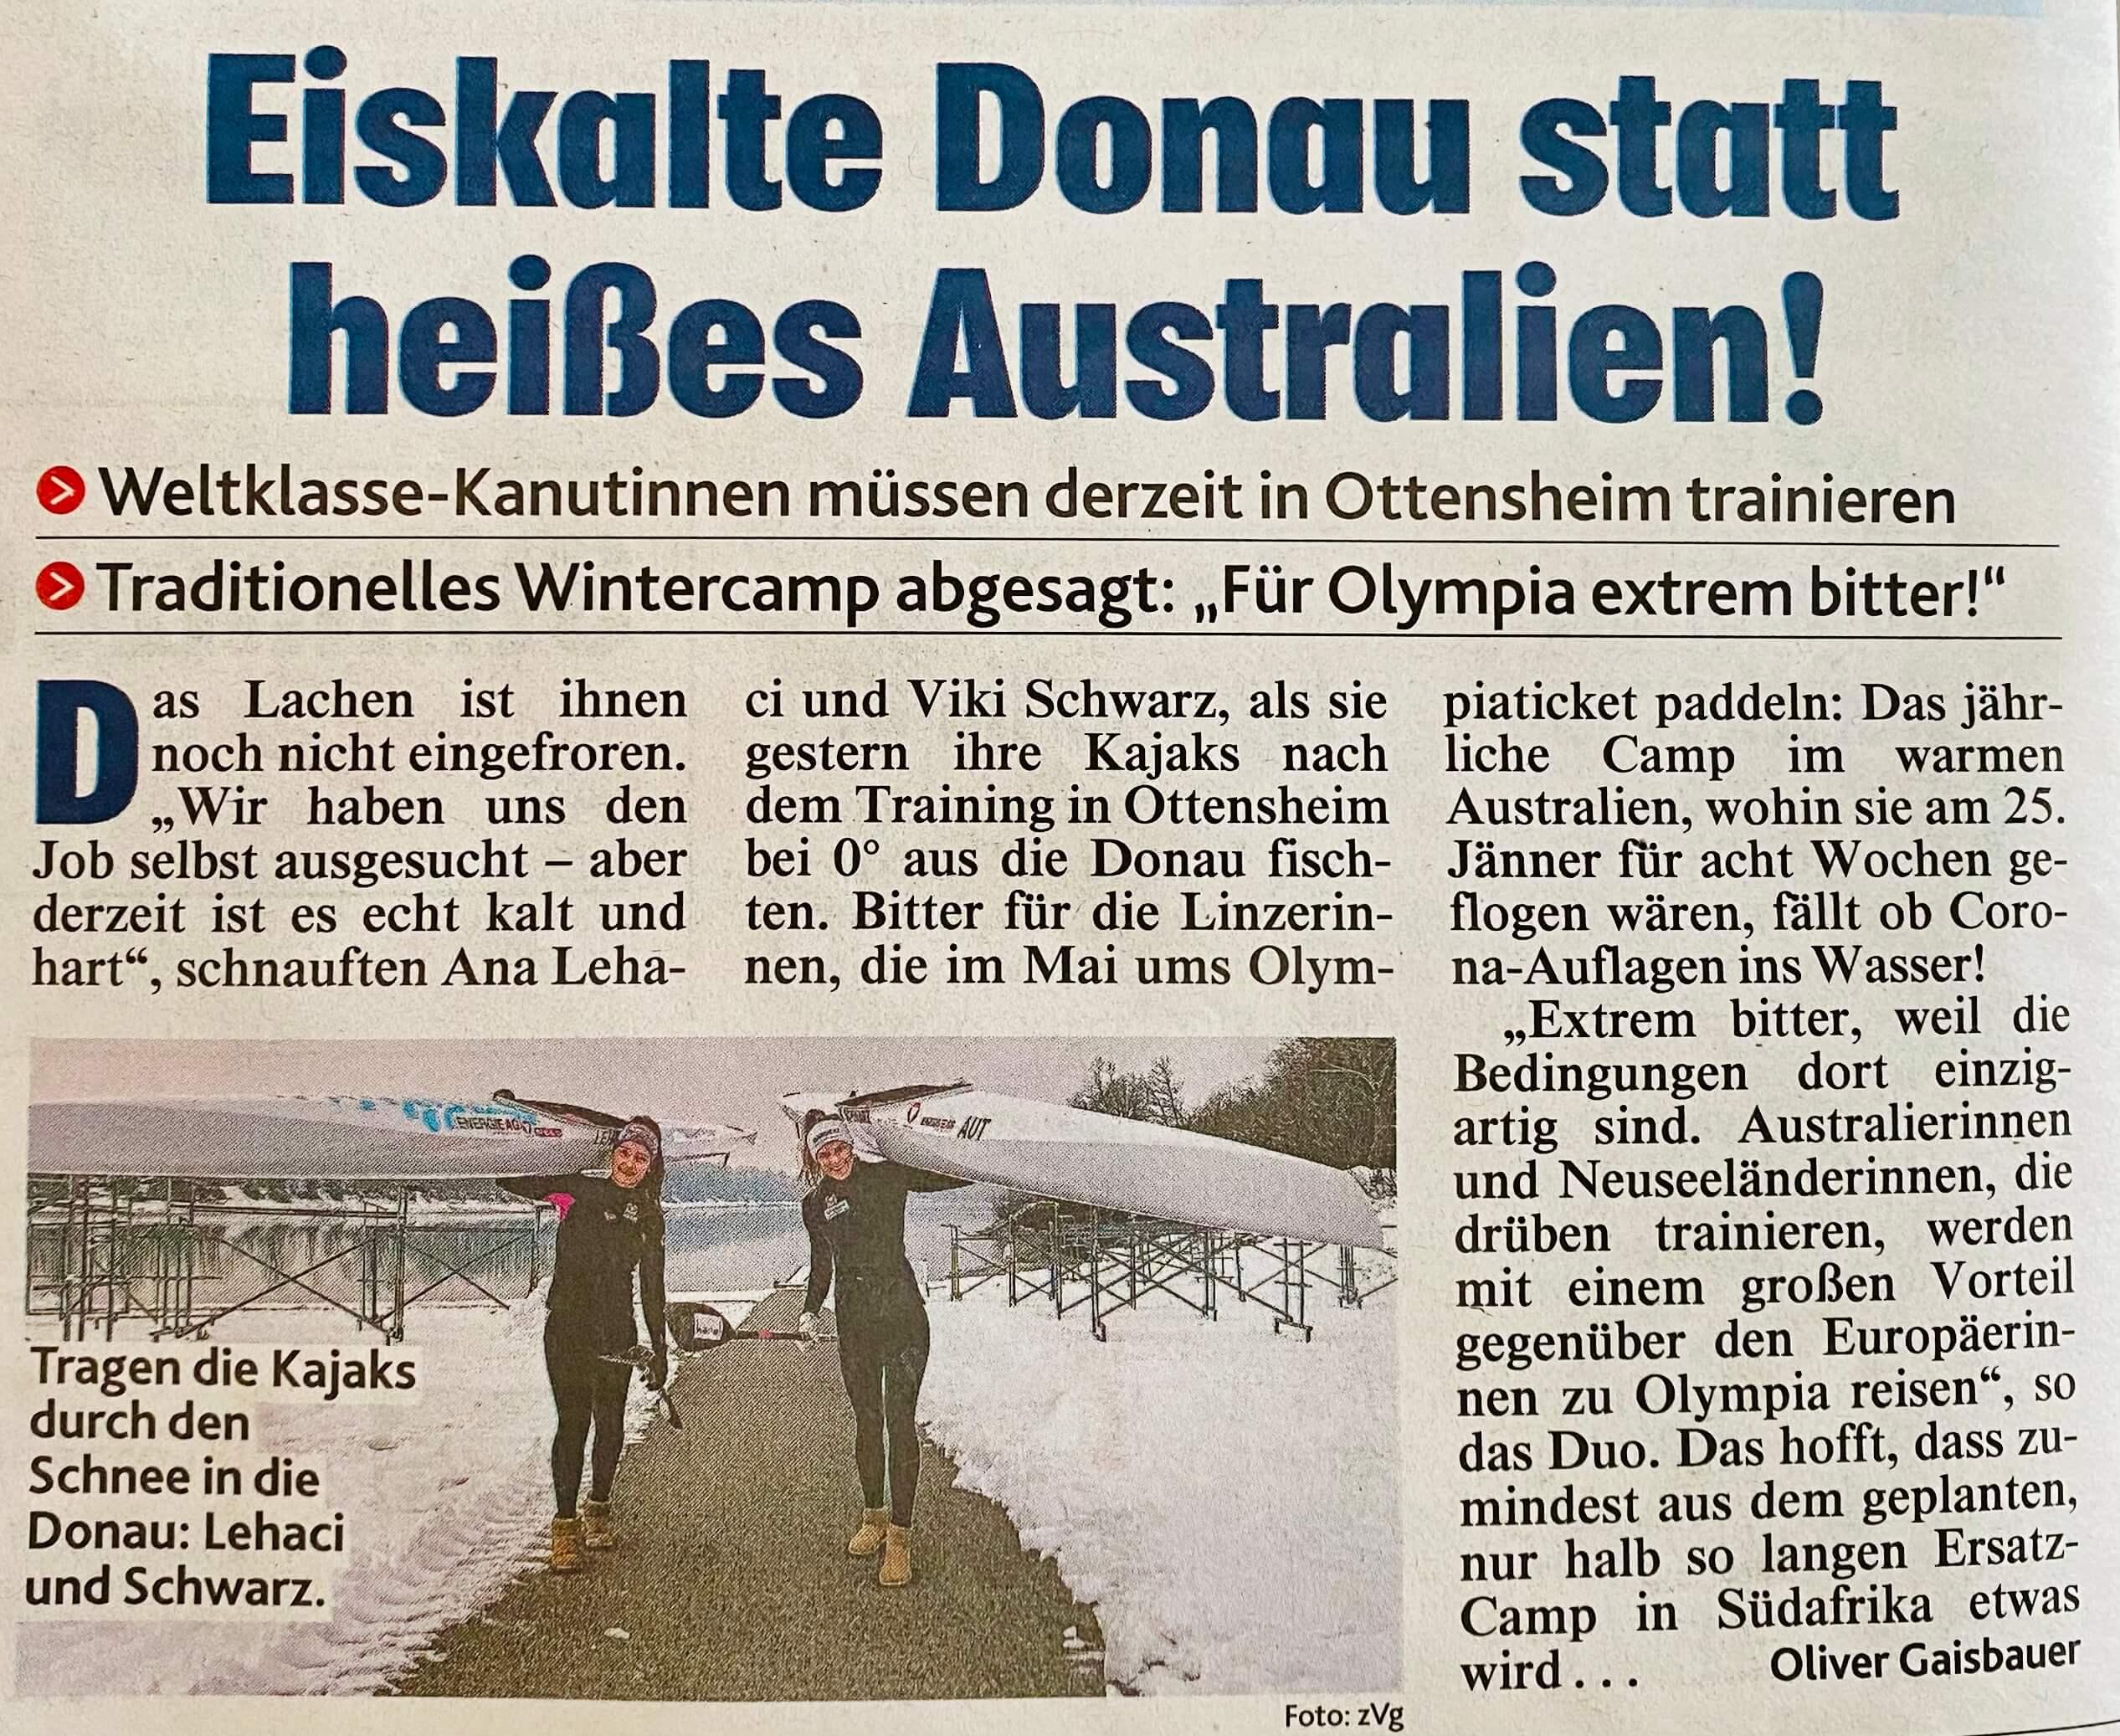 Eiskalte Donau, statt heißes Australien